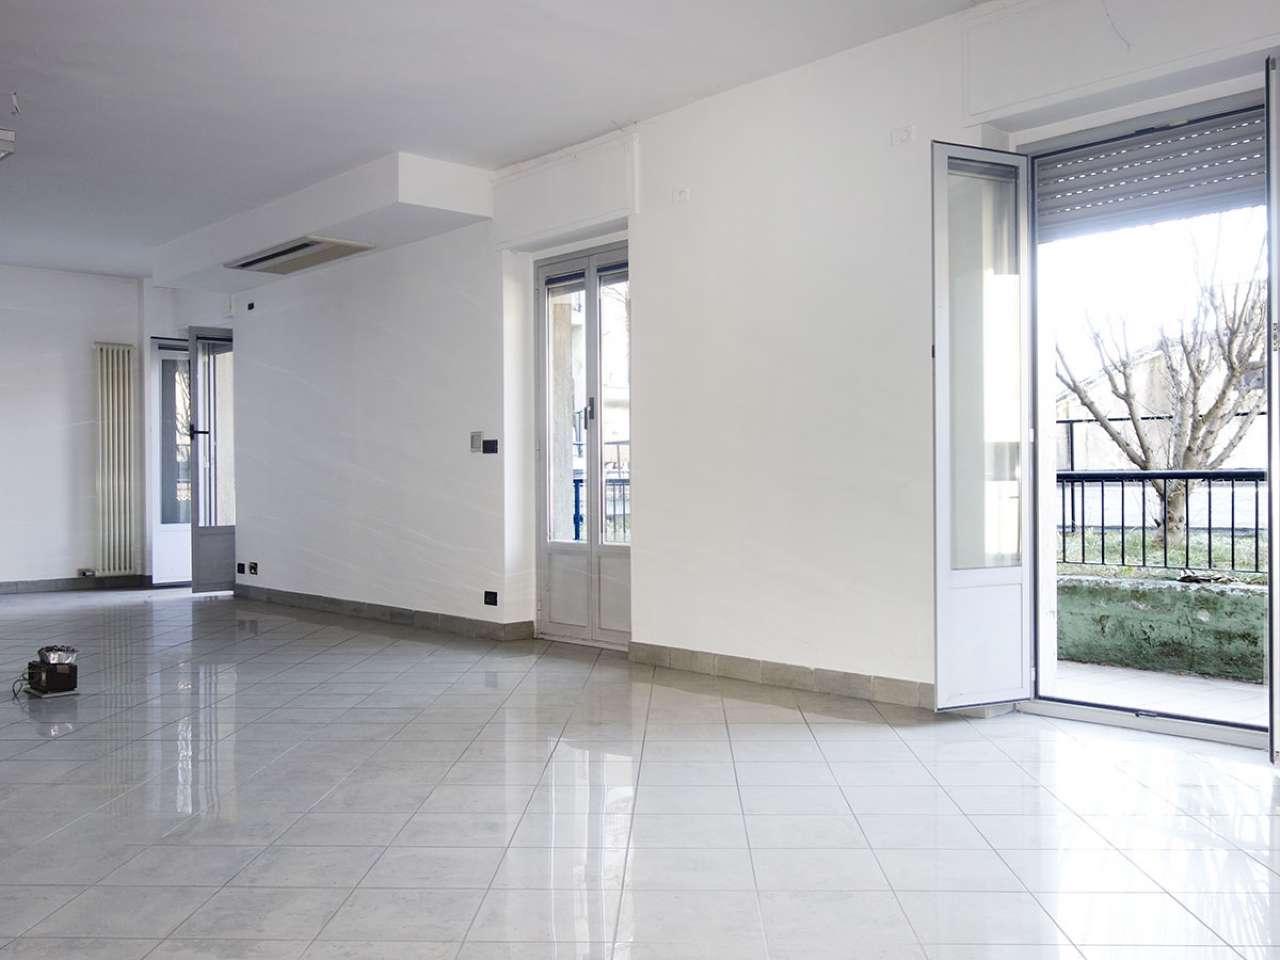 Appartamento, carrel, Vendita - Aosta